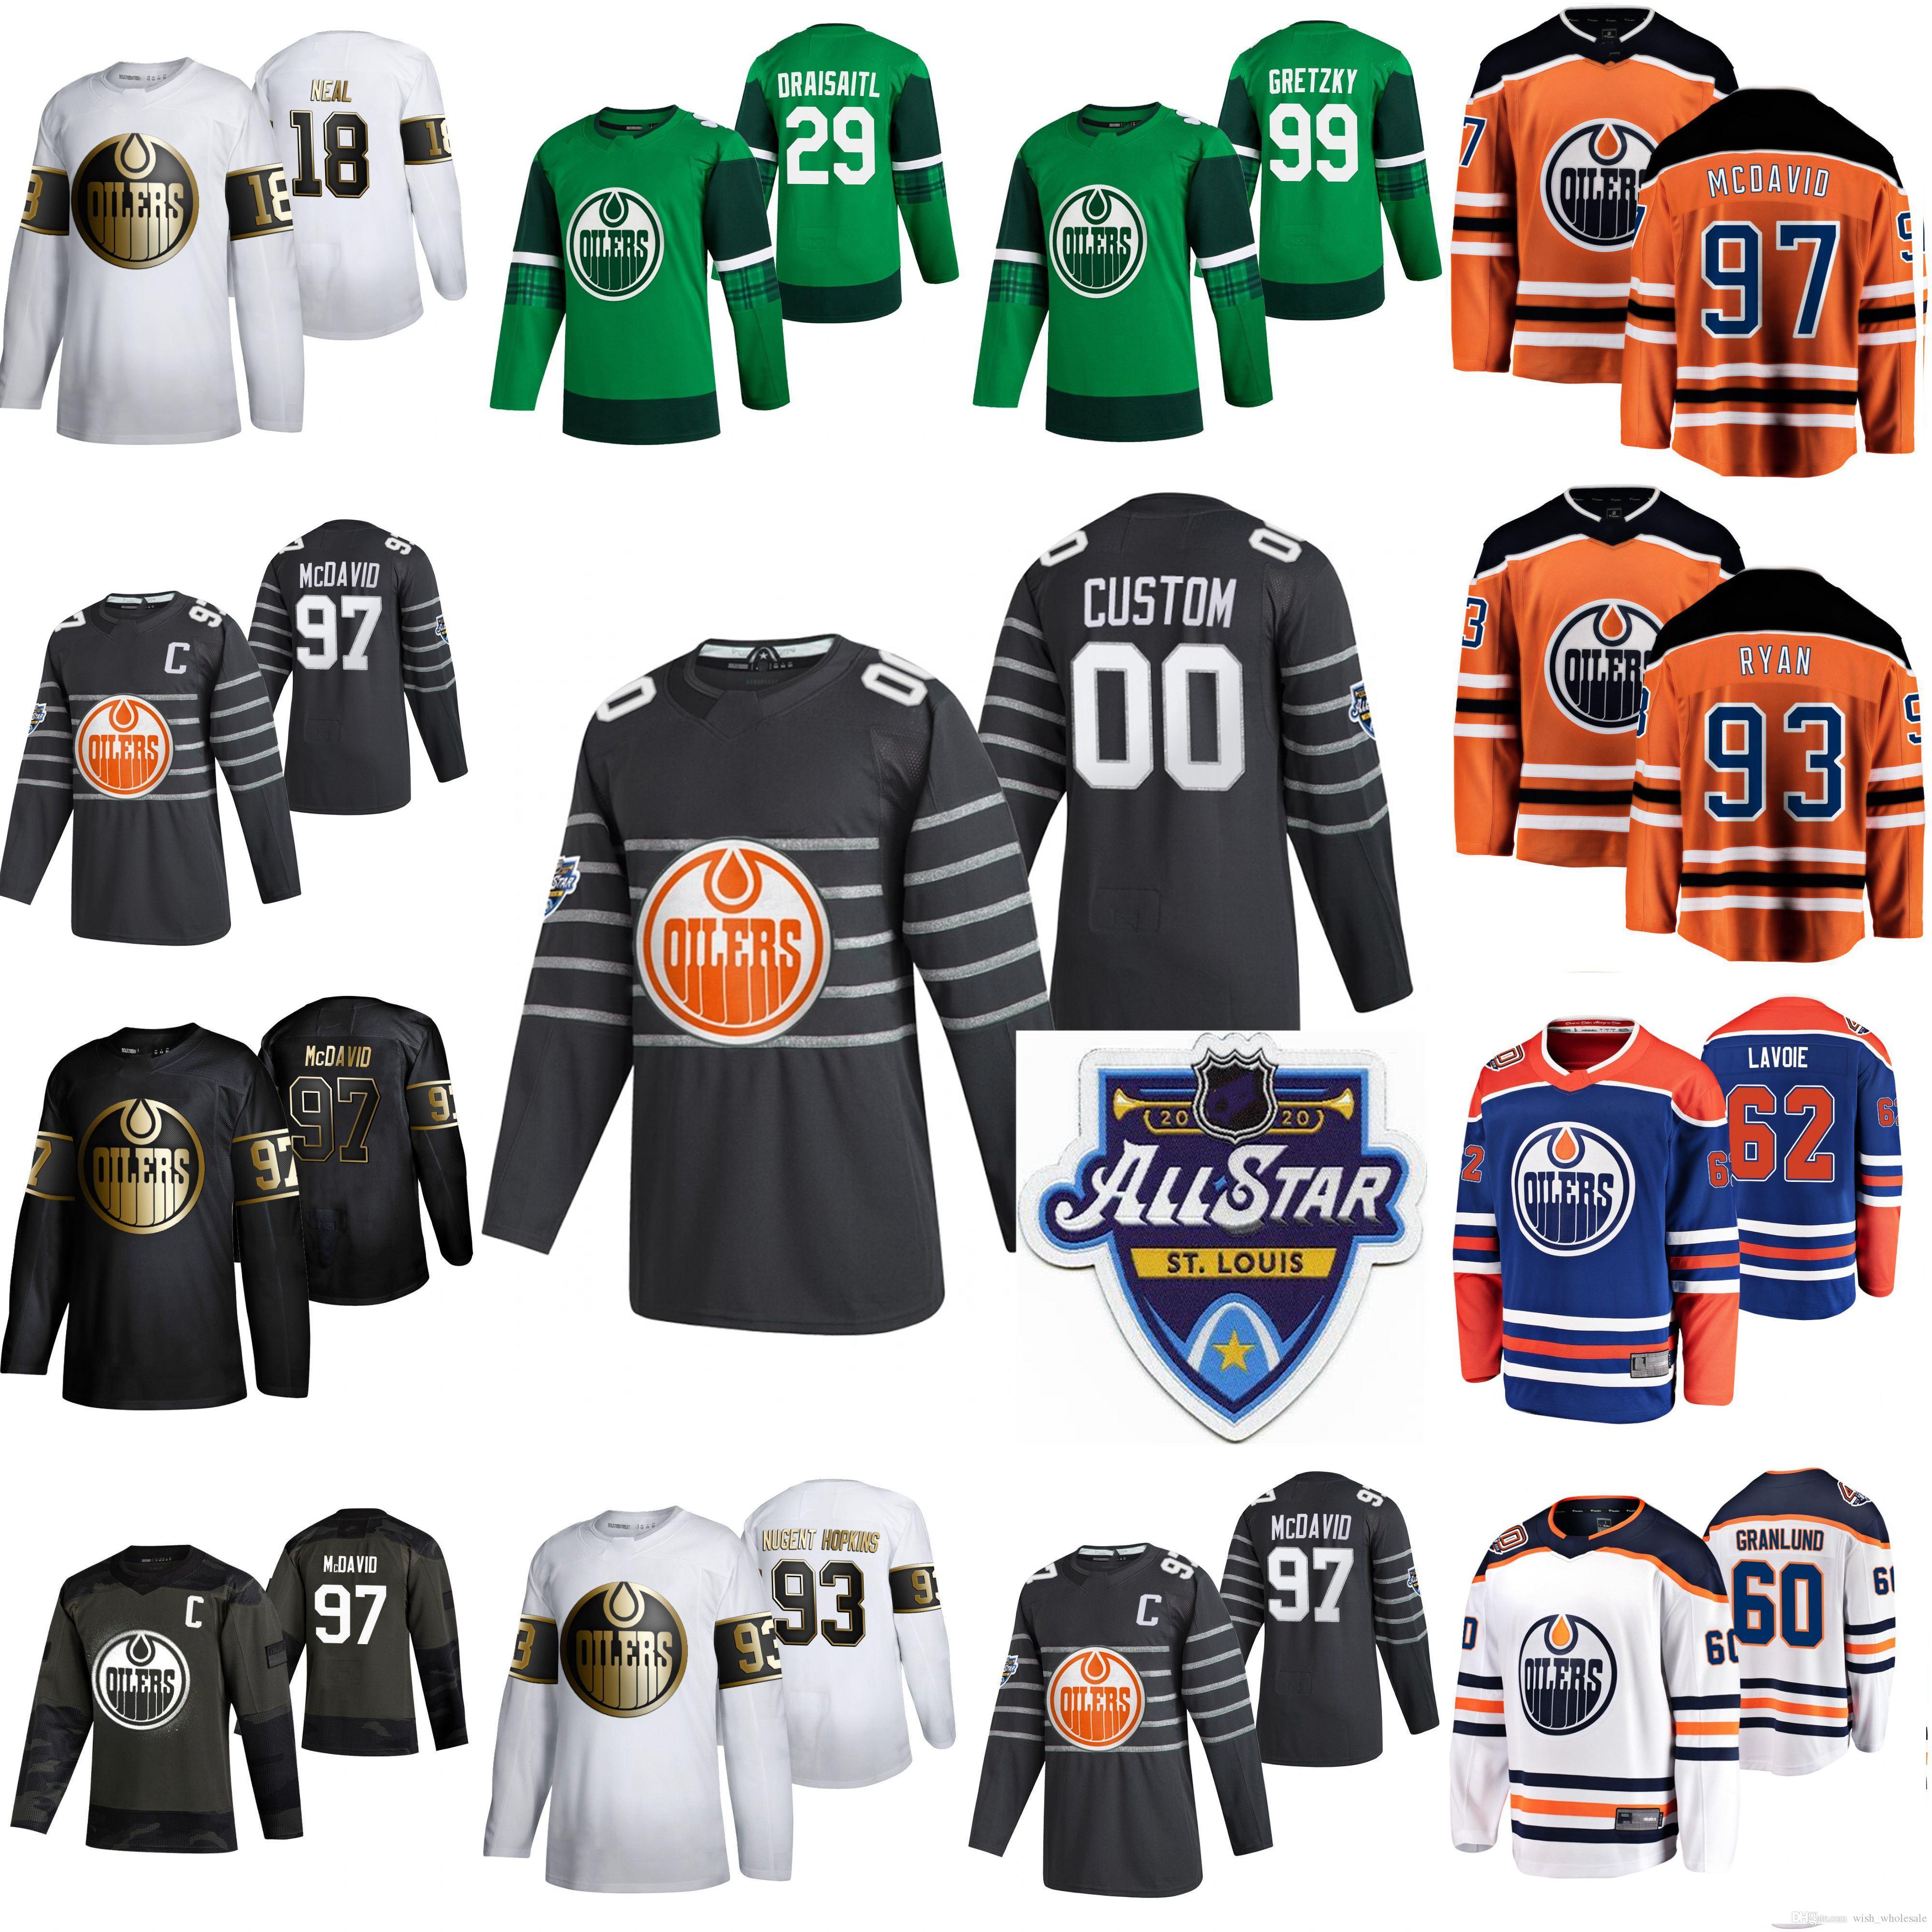 2020 Edmonton Oilers Hóquei Jerseys Golden Edition Womens 63 Tyler Ennis 28 Andreas Athanasiou 27 Mike Green Gaetan Haas Zack Kassian